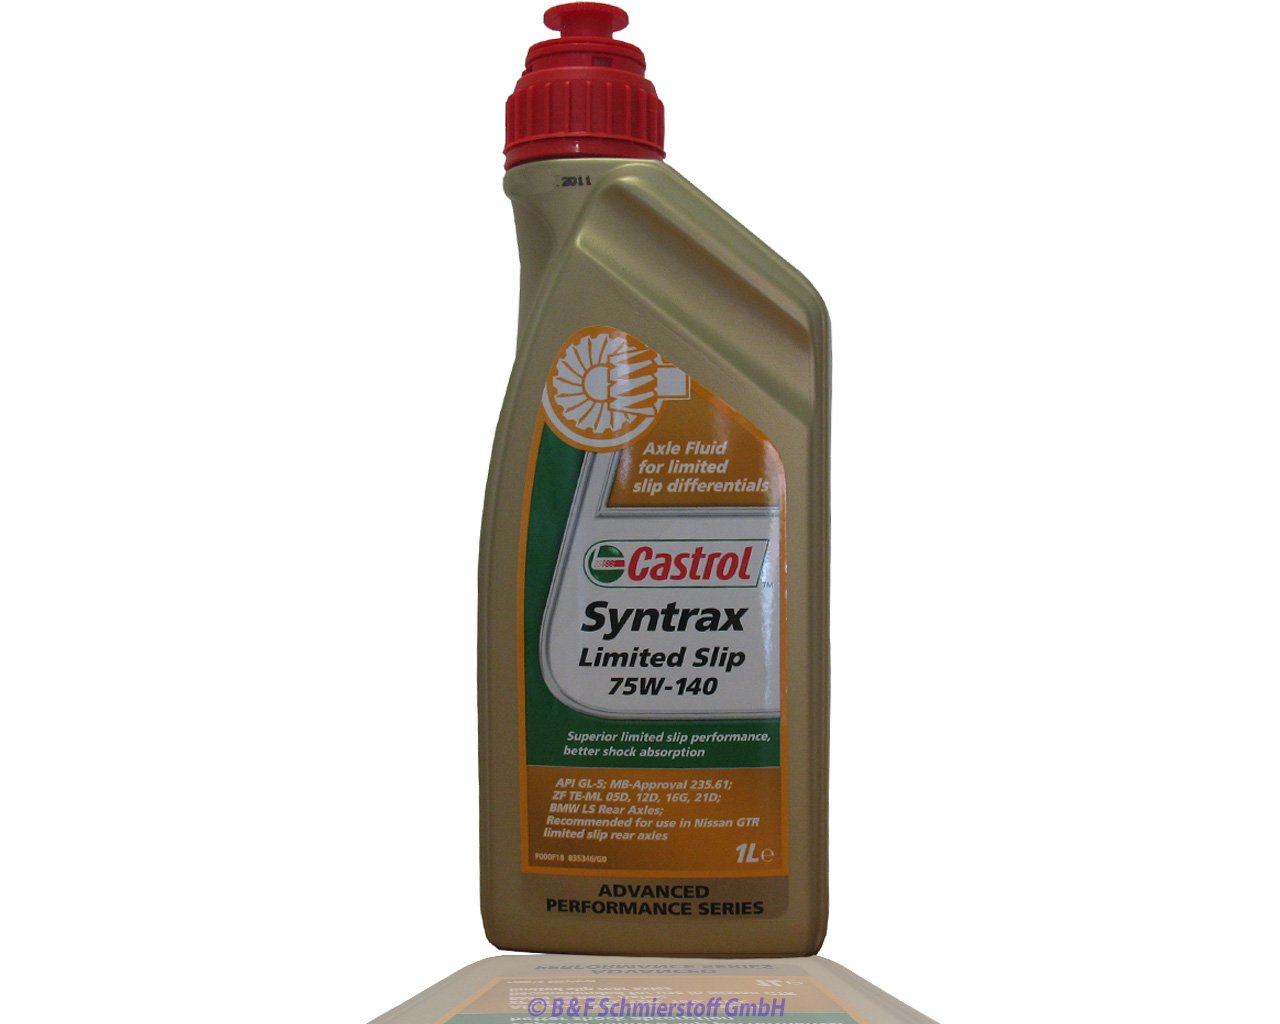 Castrol Syntrax Slip 75w-140 1 l